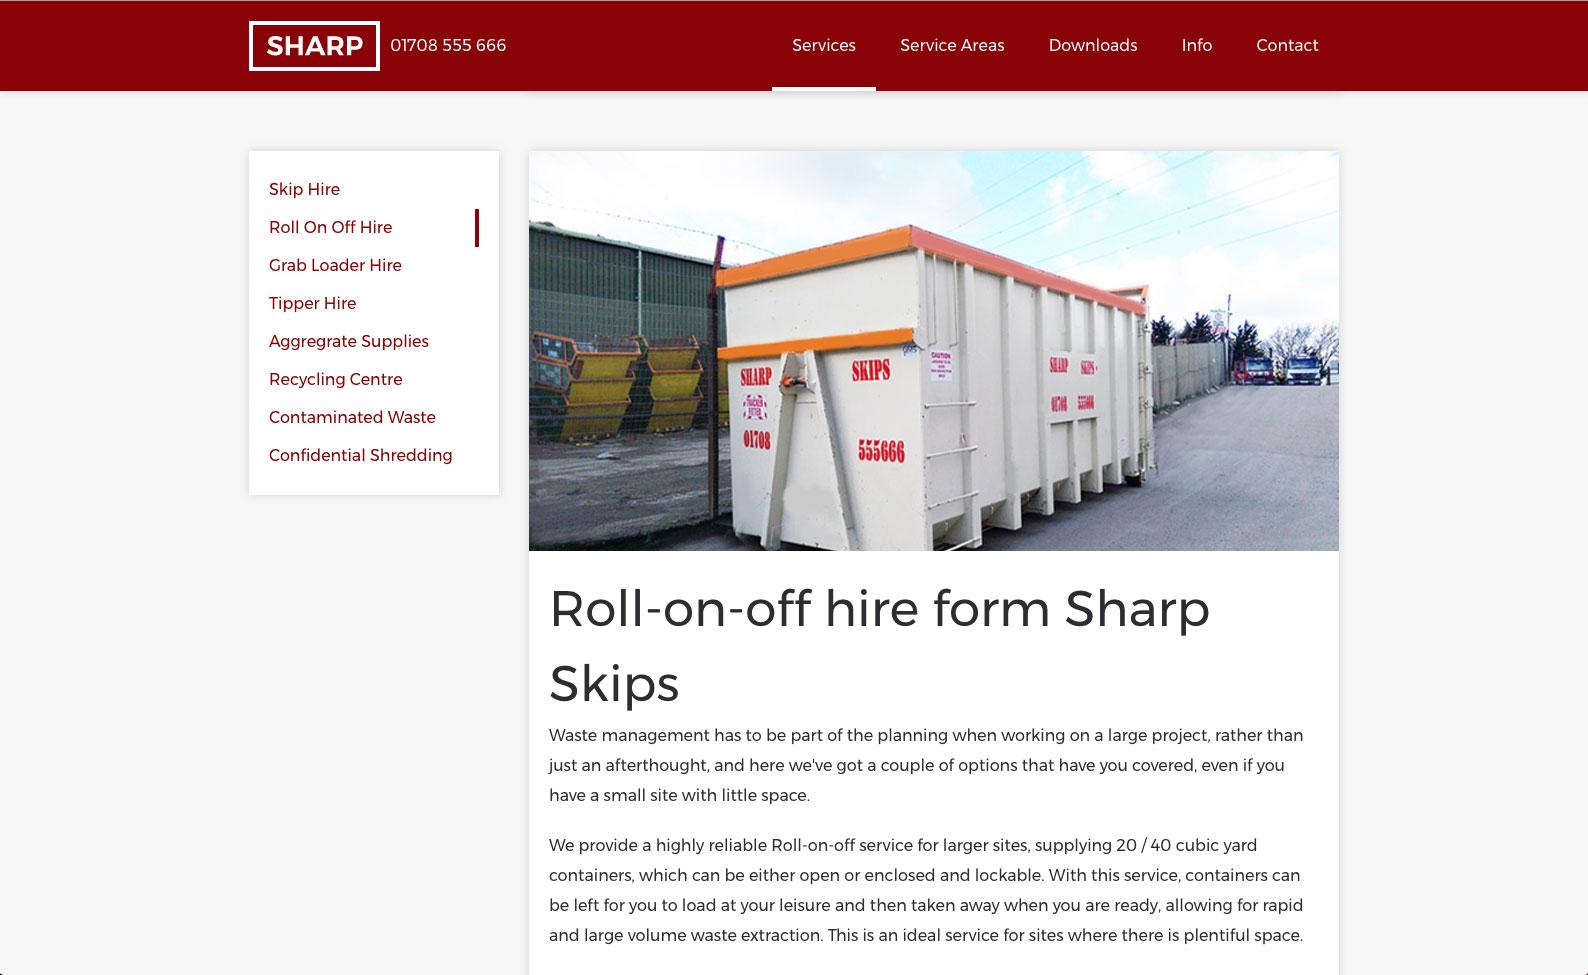 Sharp Skips